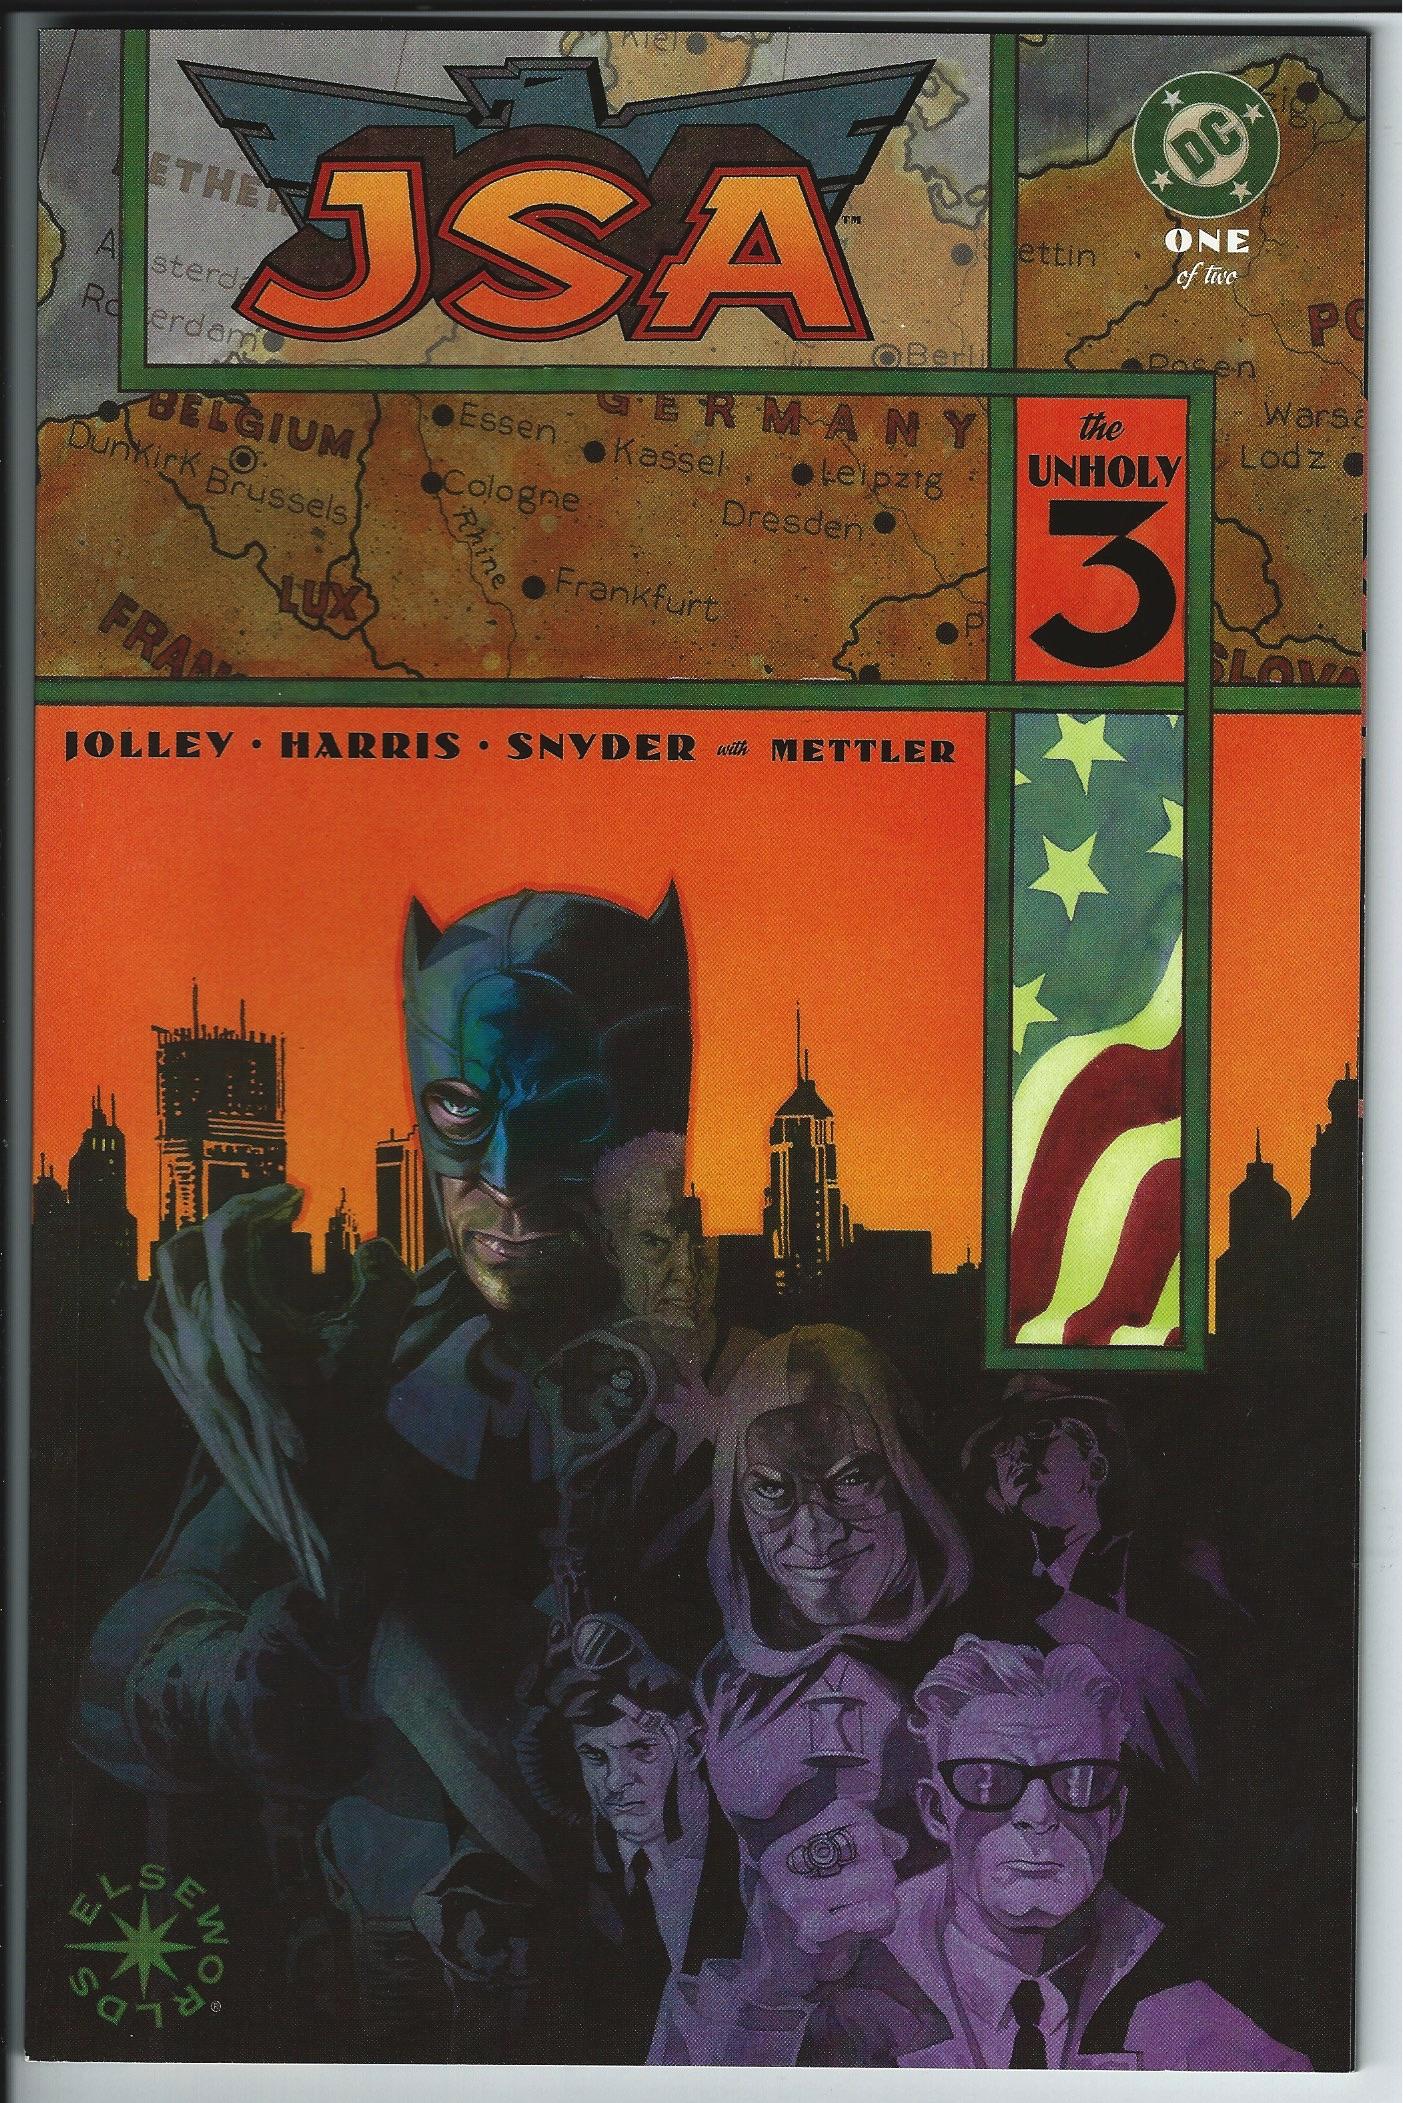 DC Comics Elseworlds JSA, The Unholy 3: 1 & 2 Graphic Novel